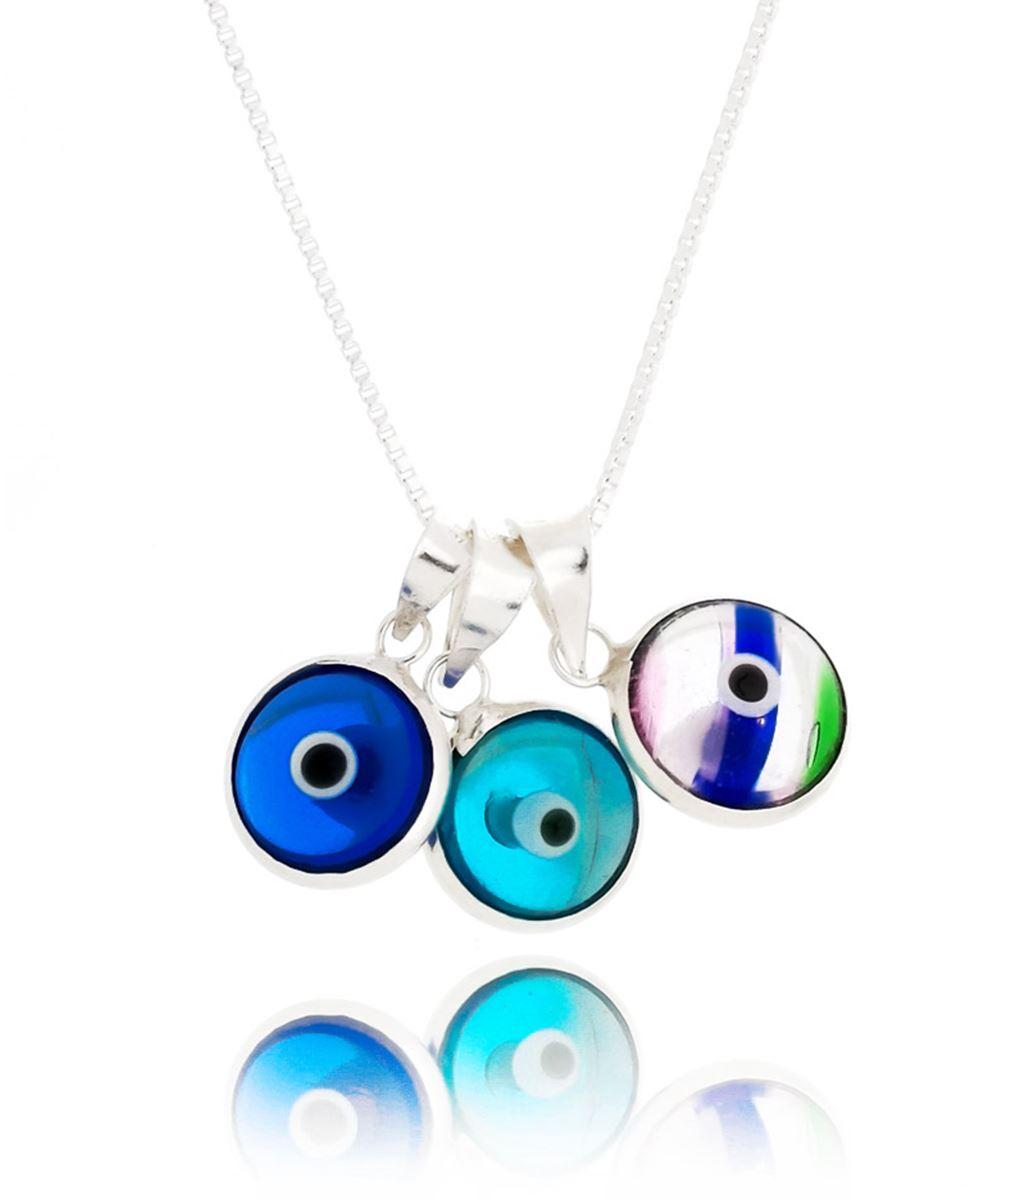 colar pingentes olhos gregos coloridos prata 925